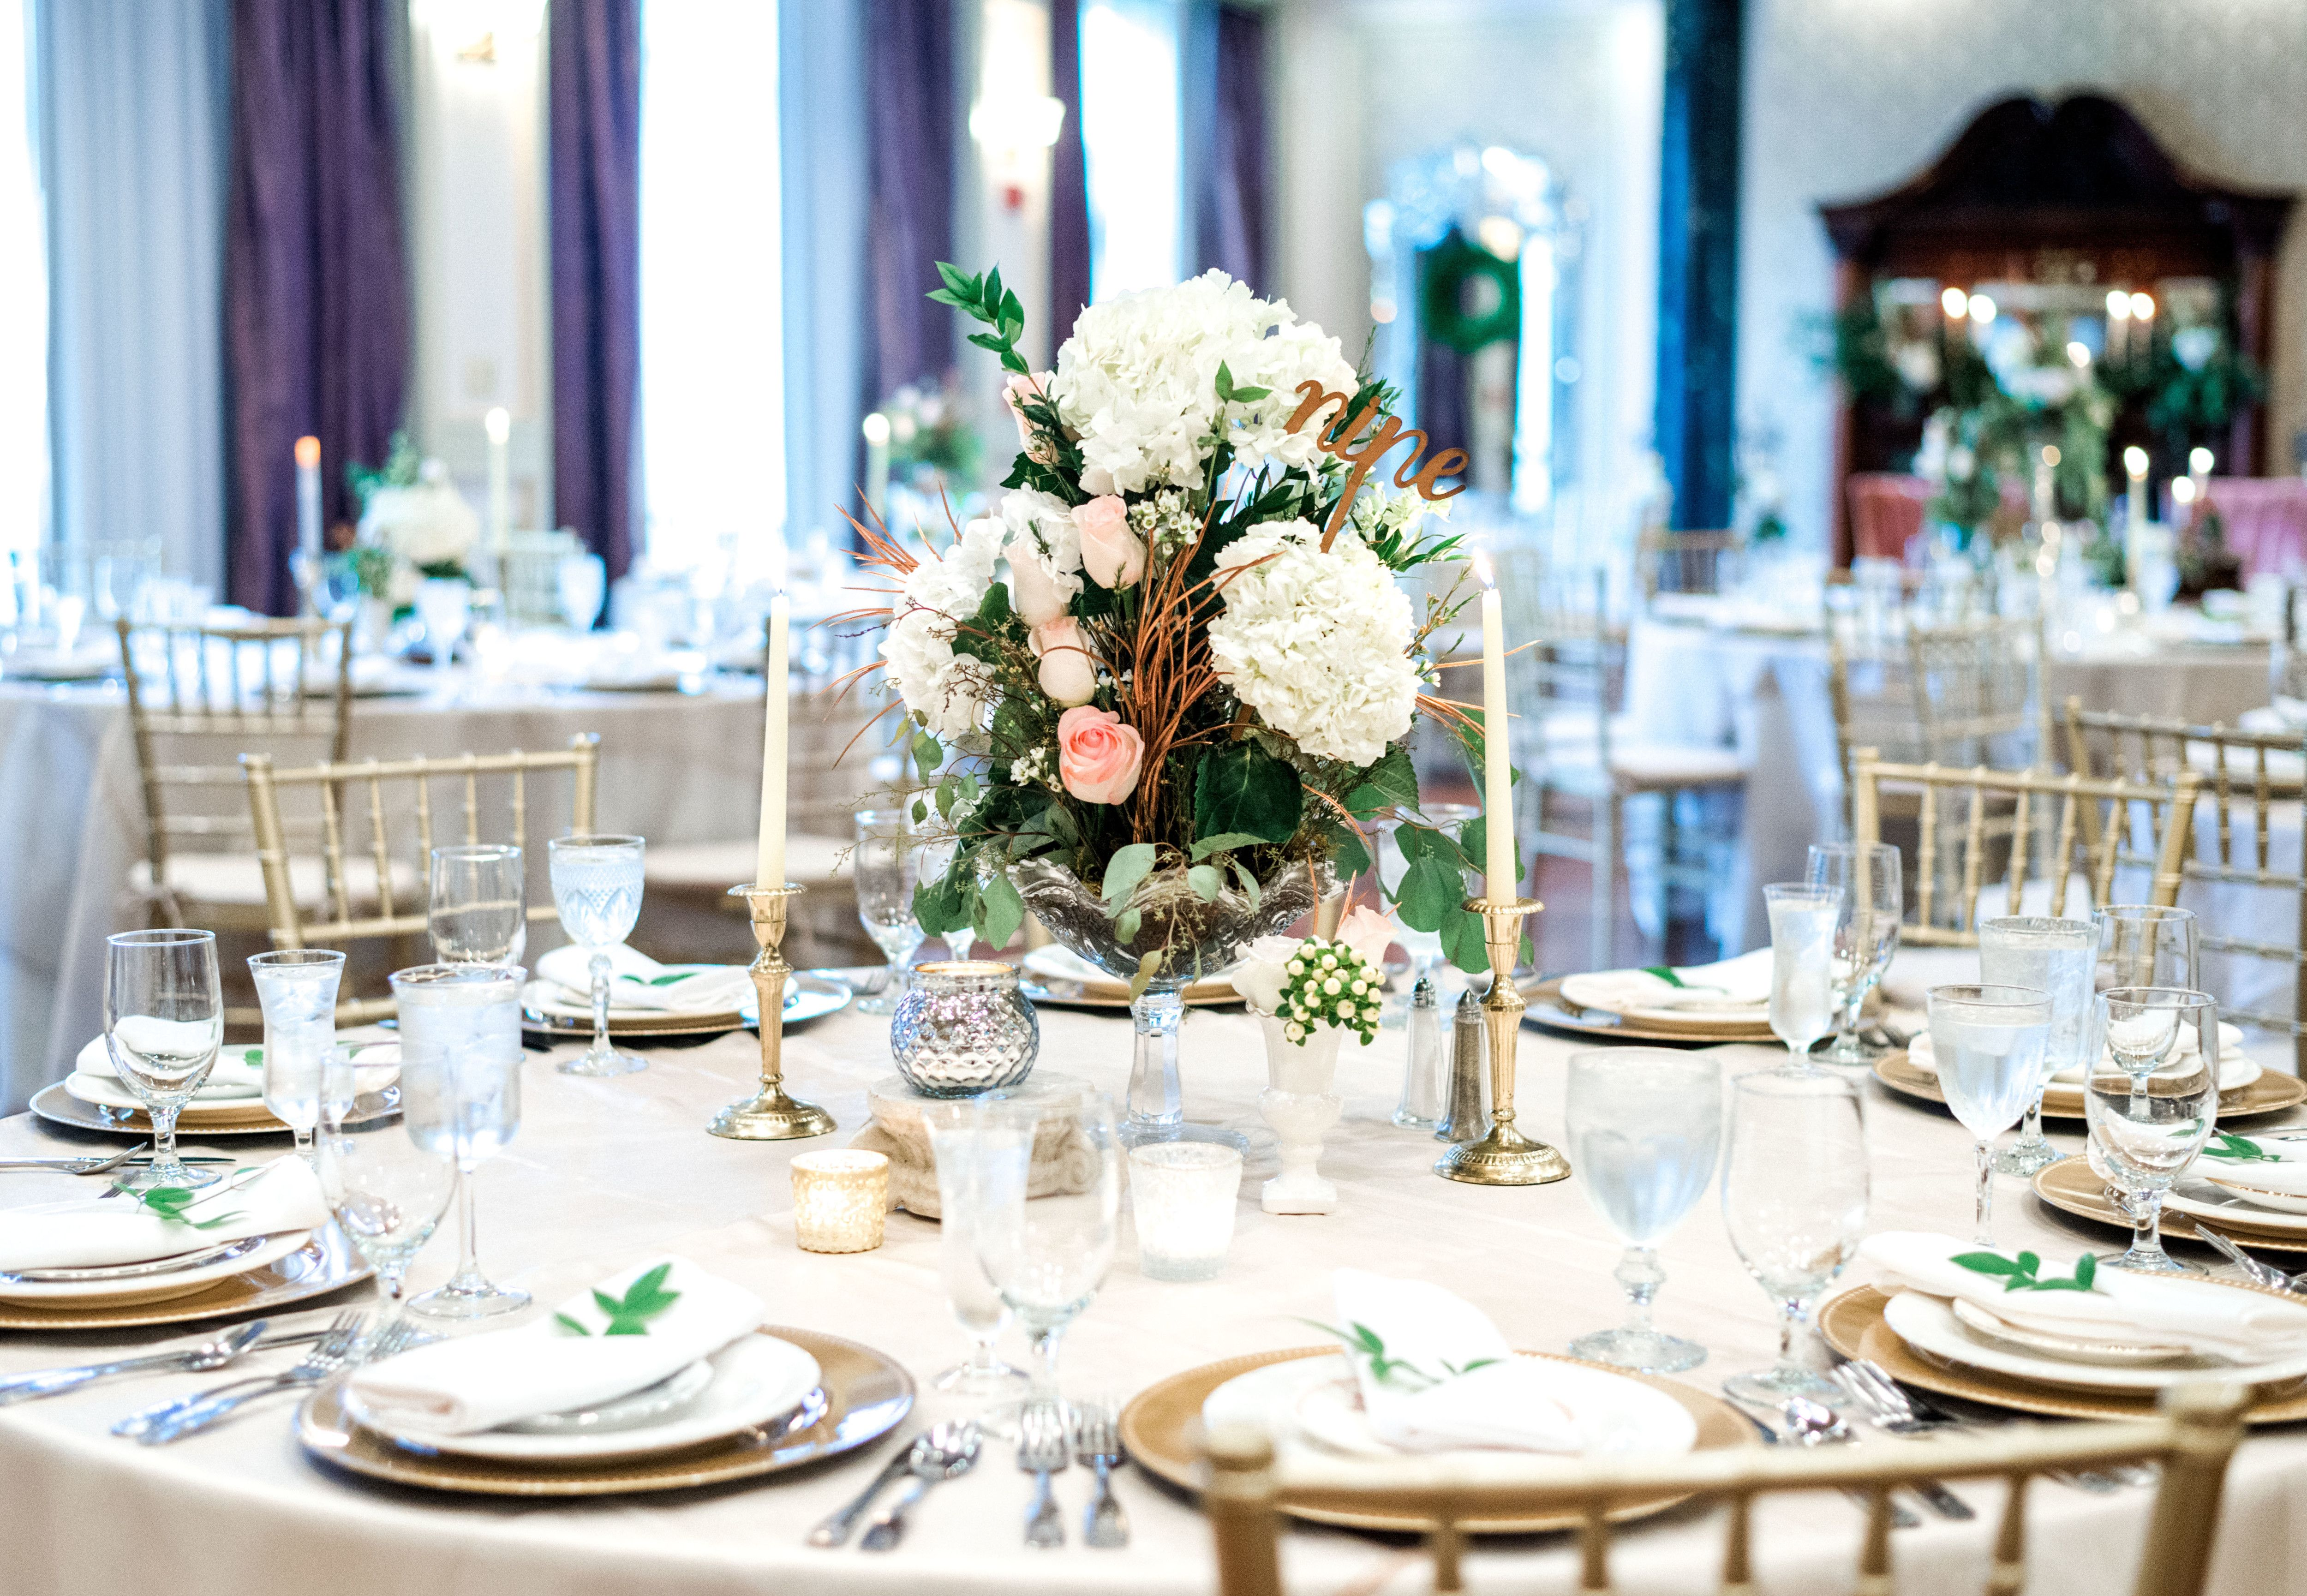 Carnegie Hotel - Tri-Cities Reception & Wedding Site. City Wedding  VenuesGold TouchElegant Table SettingsTri ...